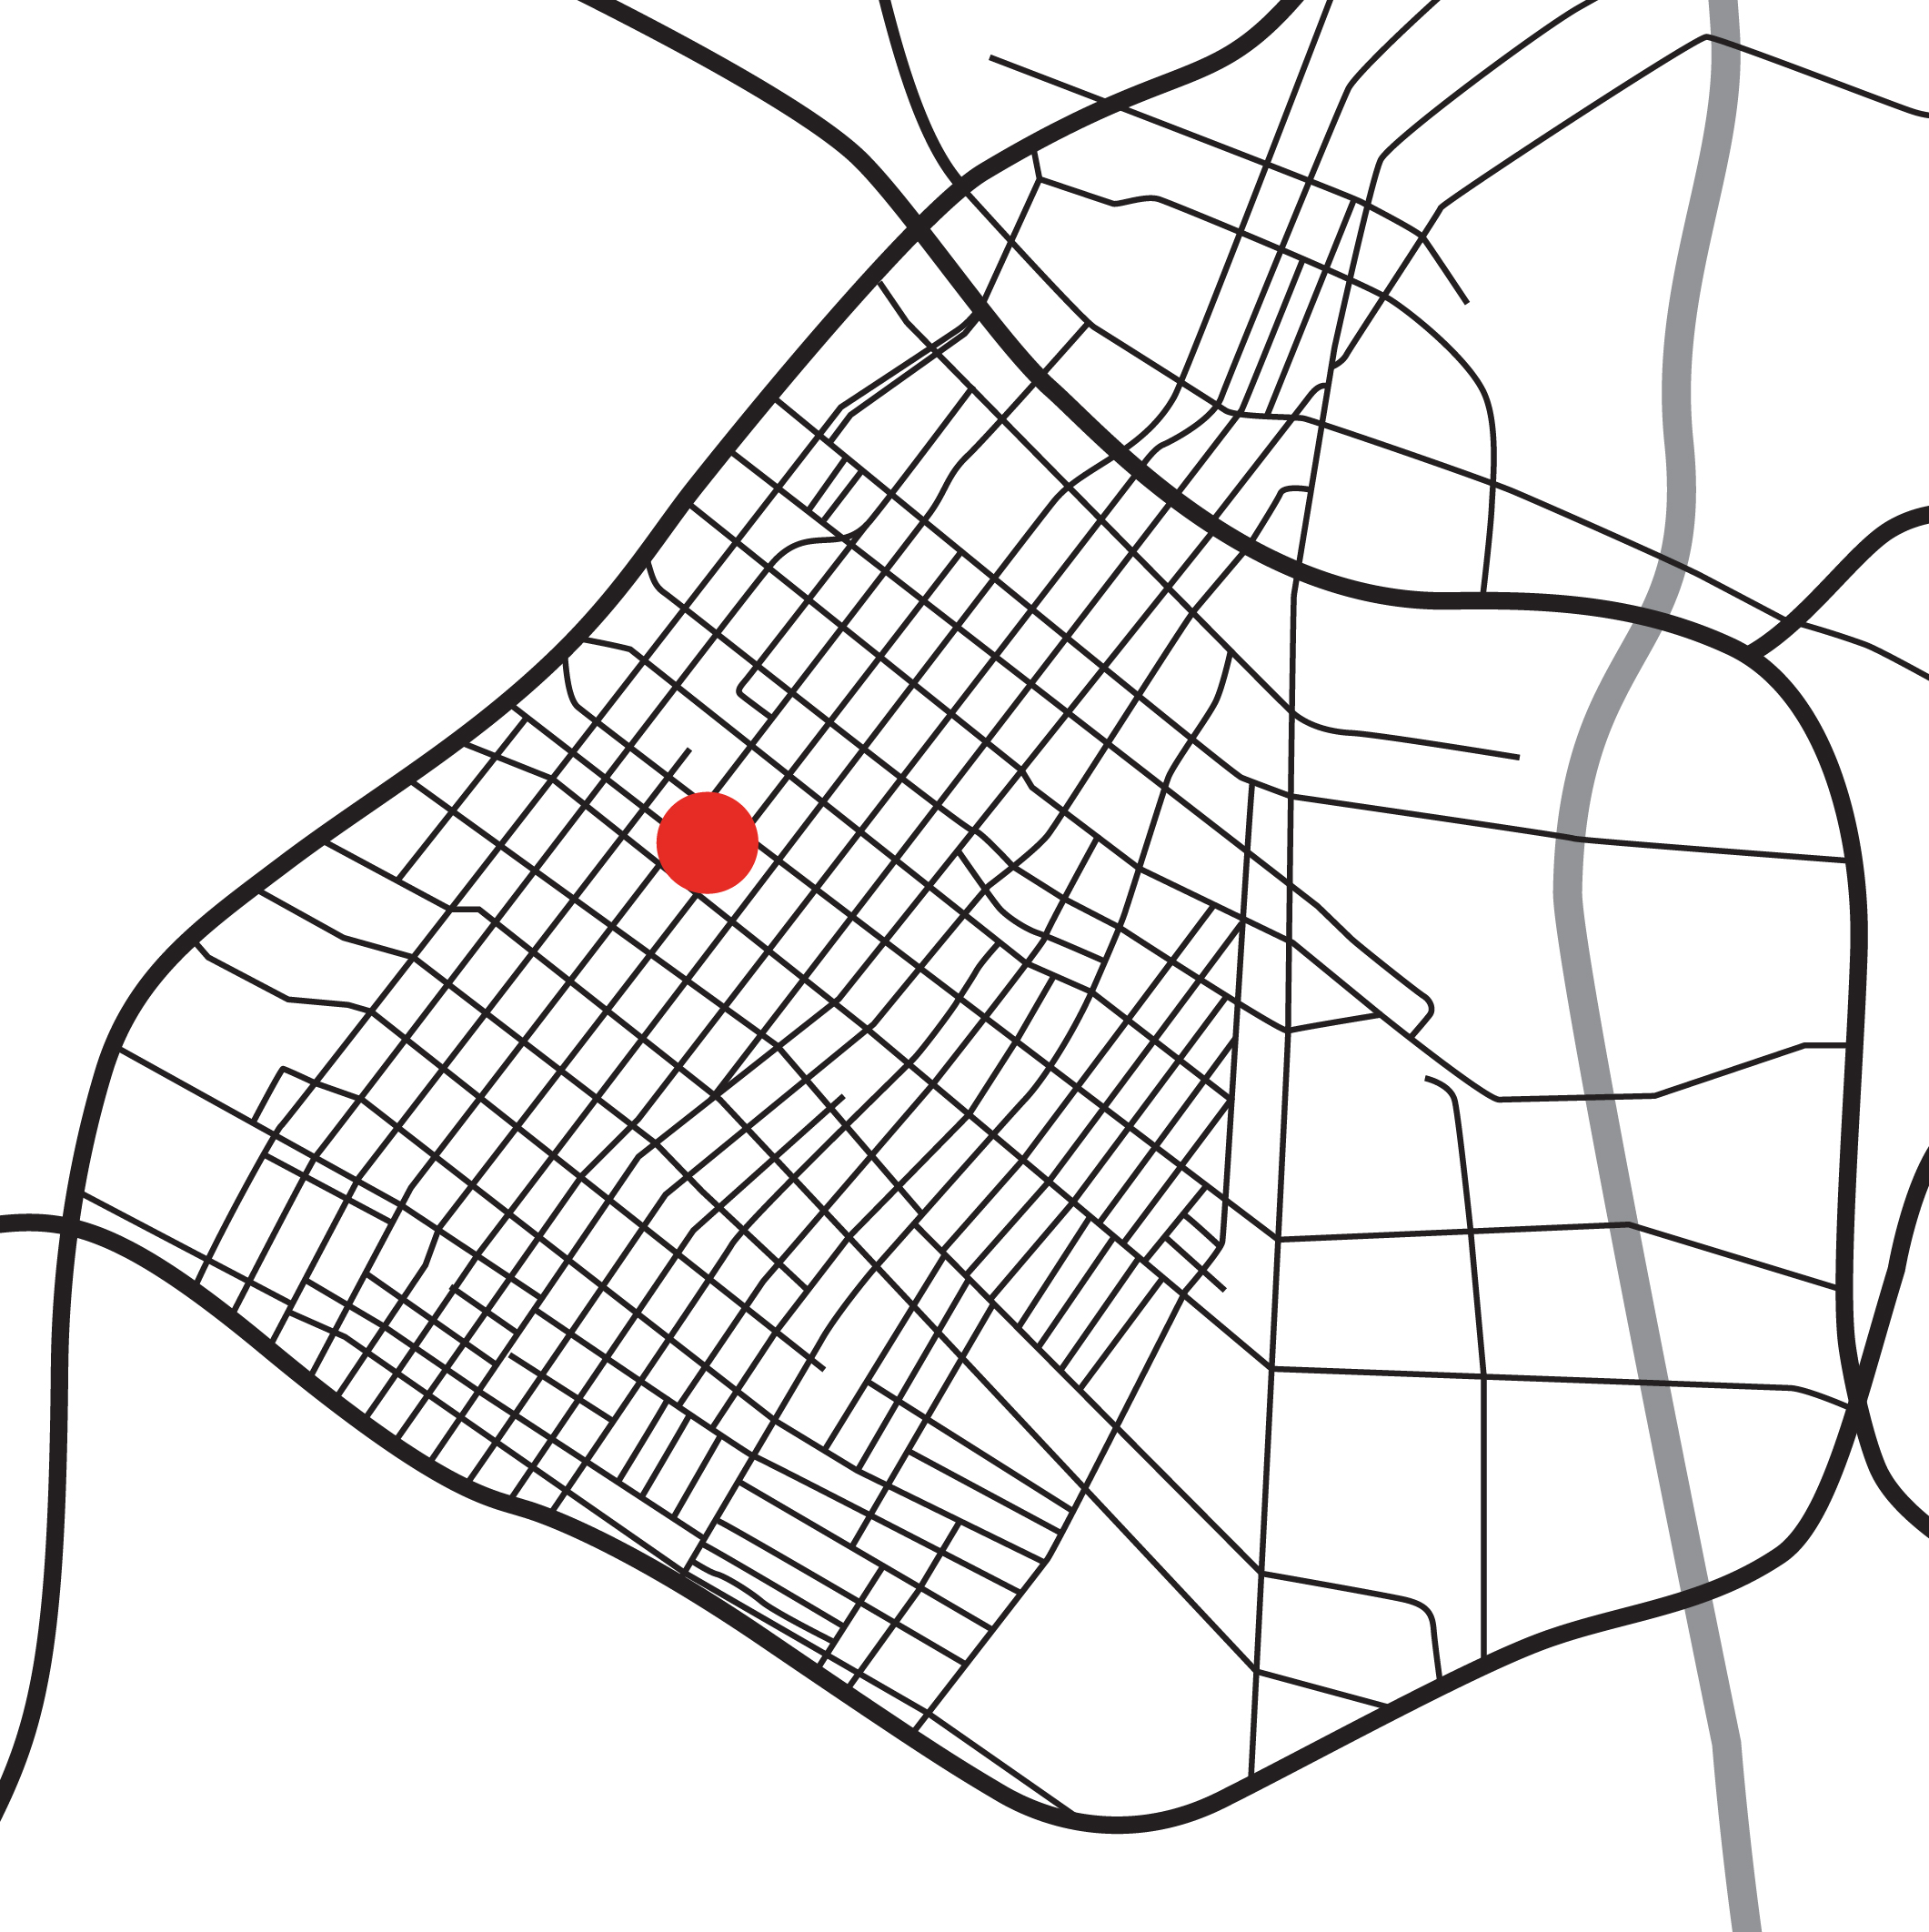 DTLA_MAP_003_James Oviatt Building-01.jpg